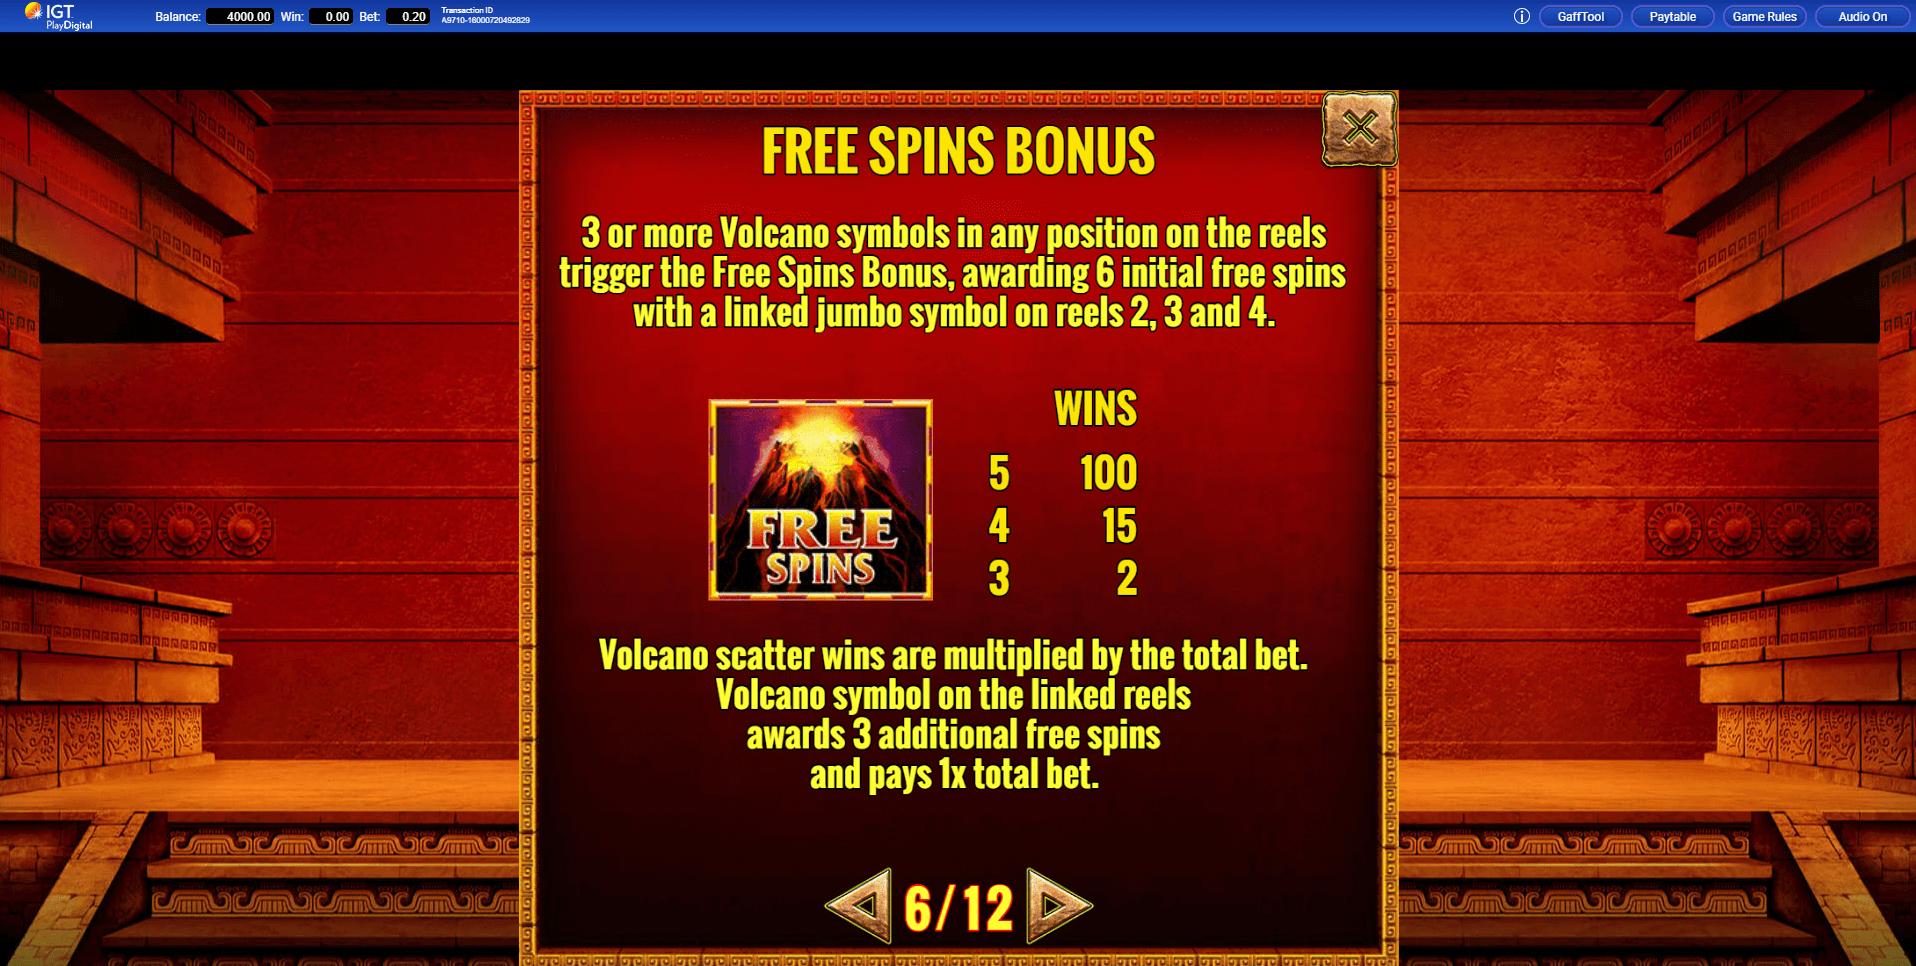 G3m online casino